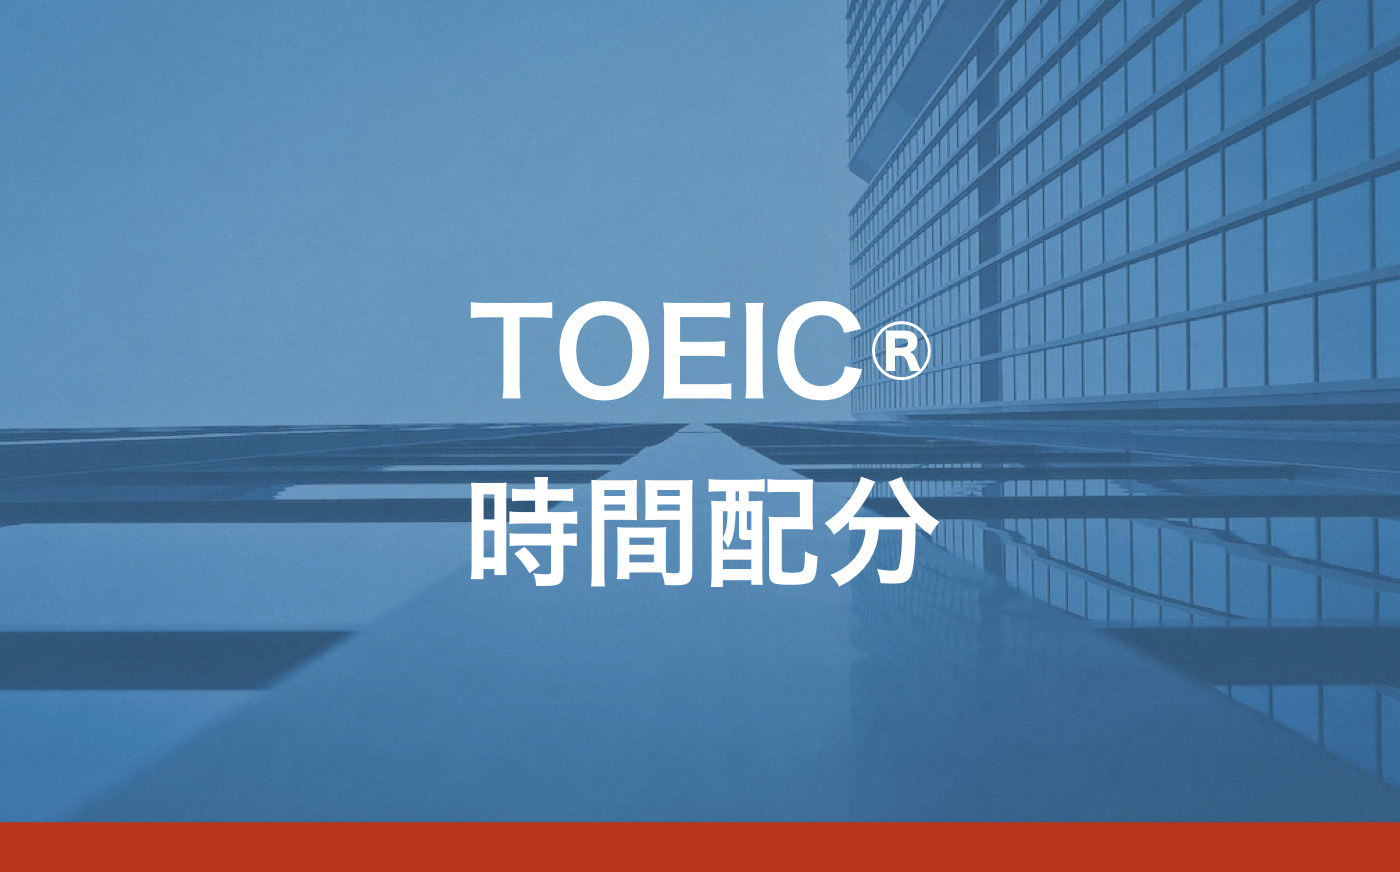 Toeic 時間 配分 新形式TOEICの時間配分&解く順番の必勝法を教えます!